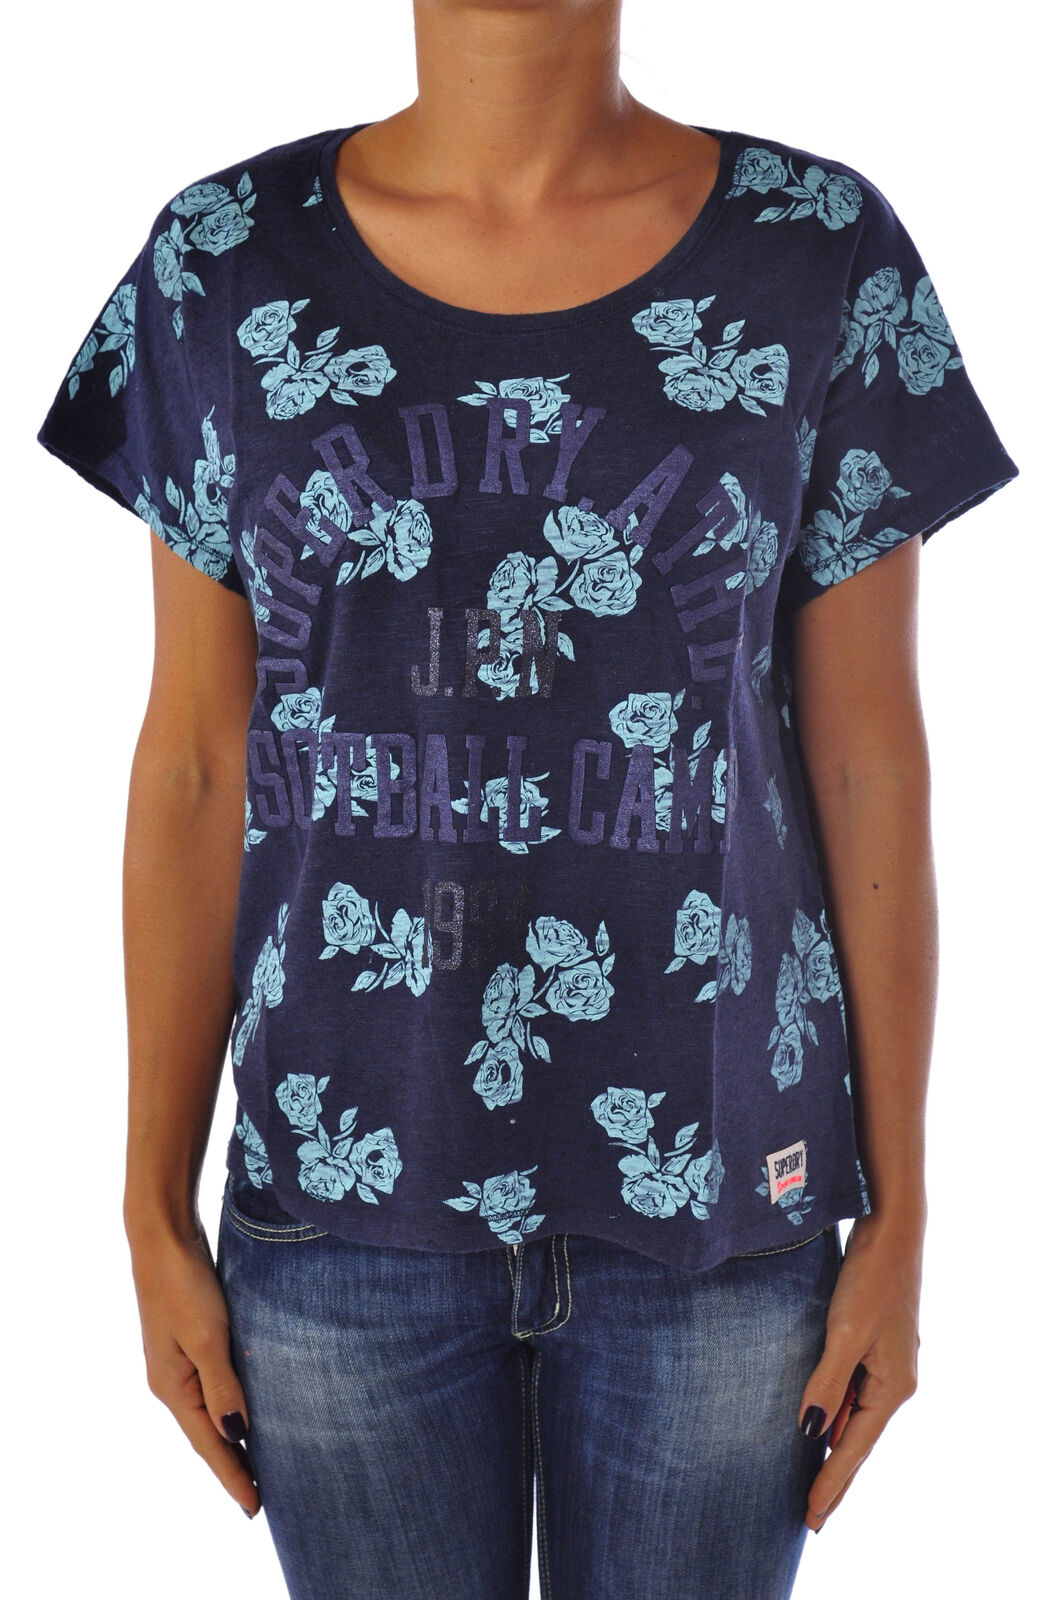 Superdry - Topwear-T-shirts - Woman - Blau - 969318C184038